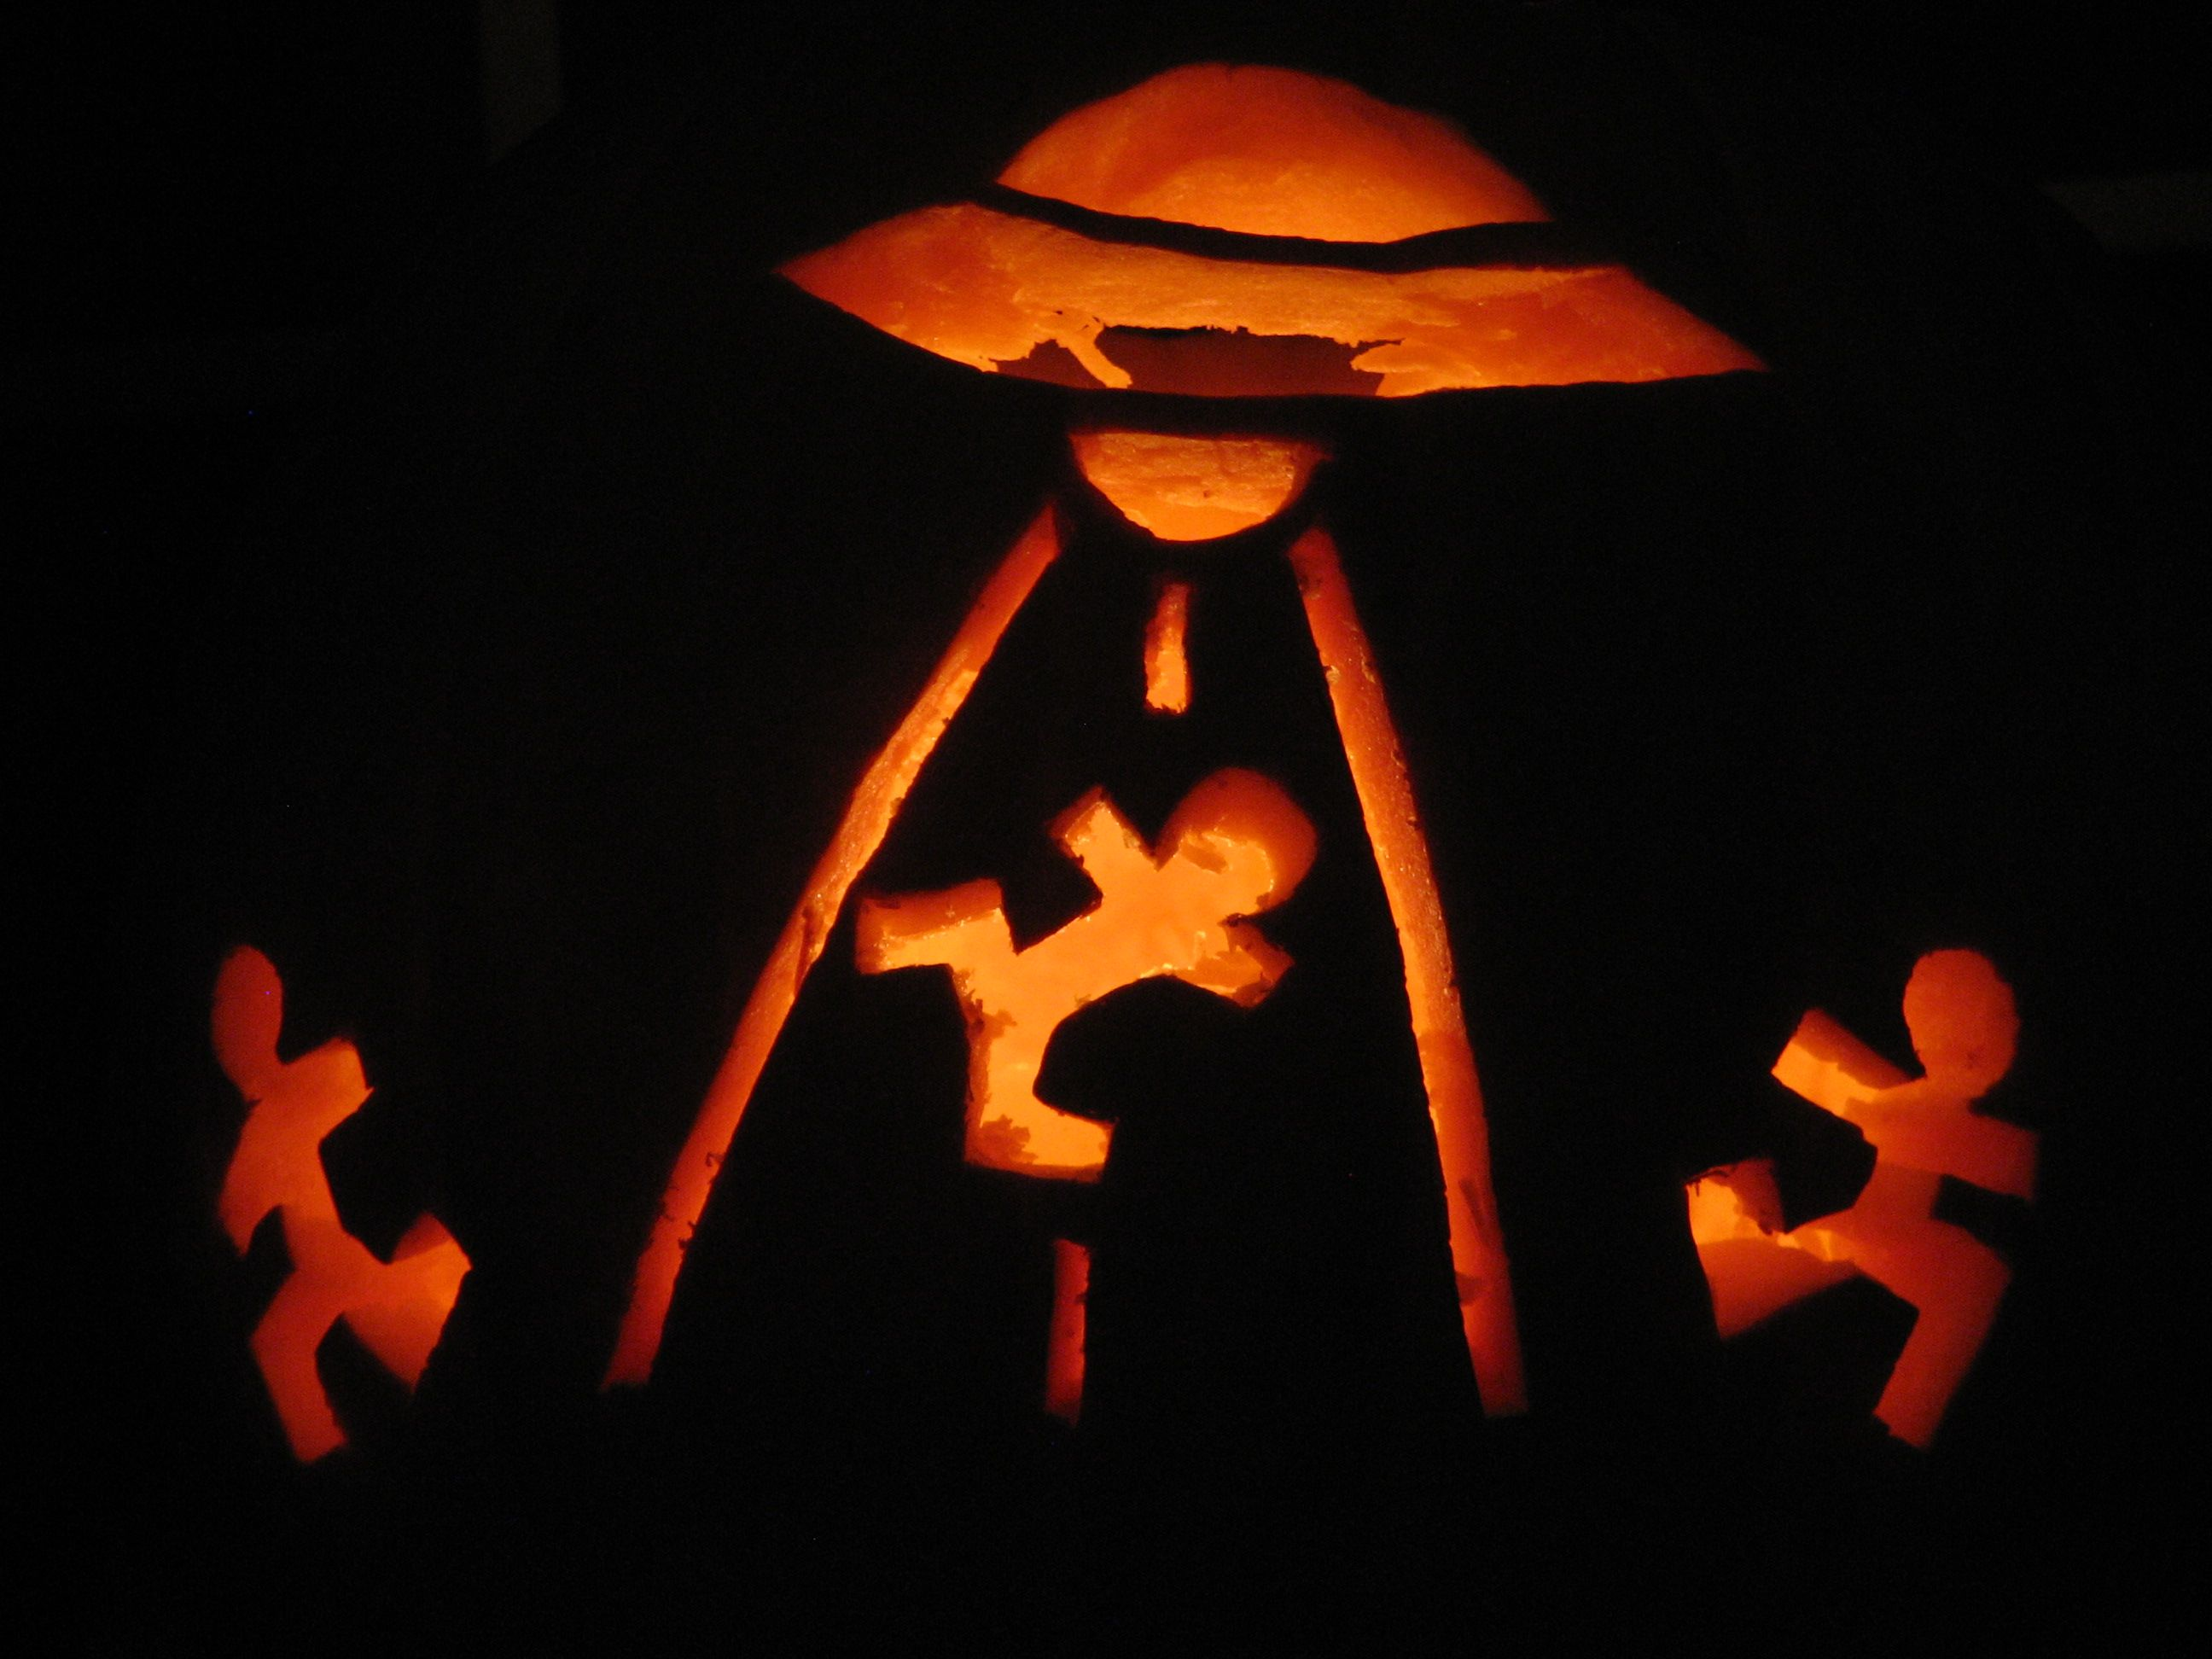 ufo pumpkin stencil puiyoaxg veracitypoint info u2022 rh puiyoaxg veracitypoint info